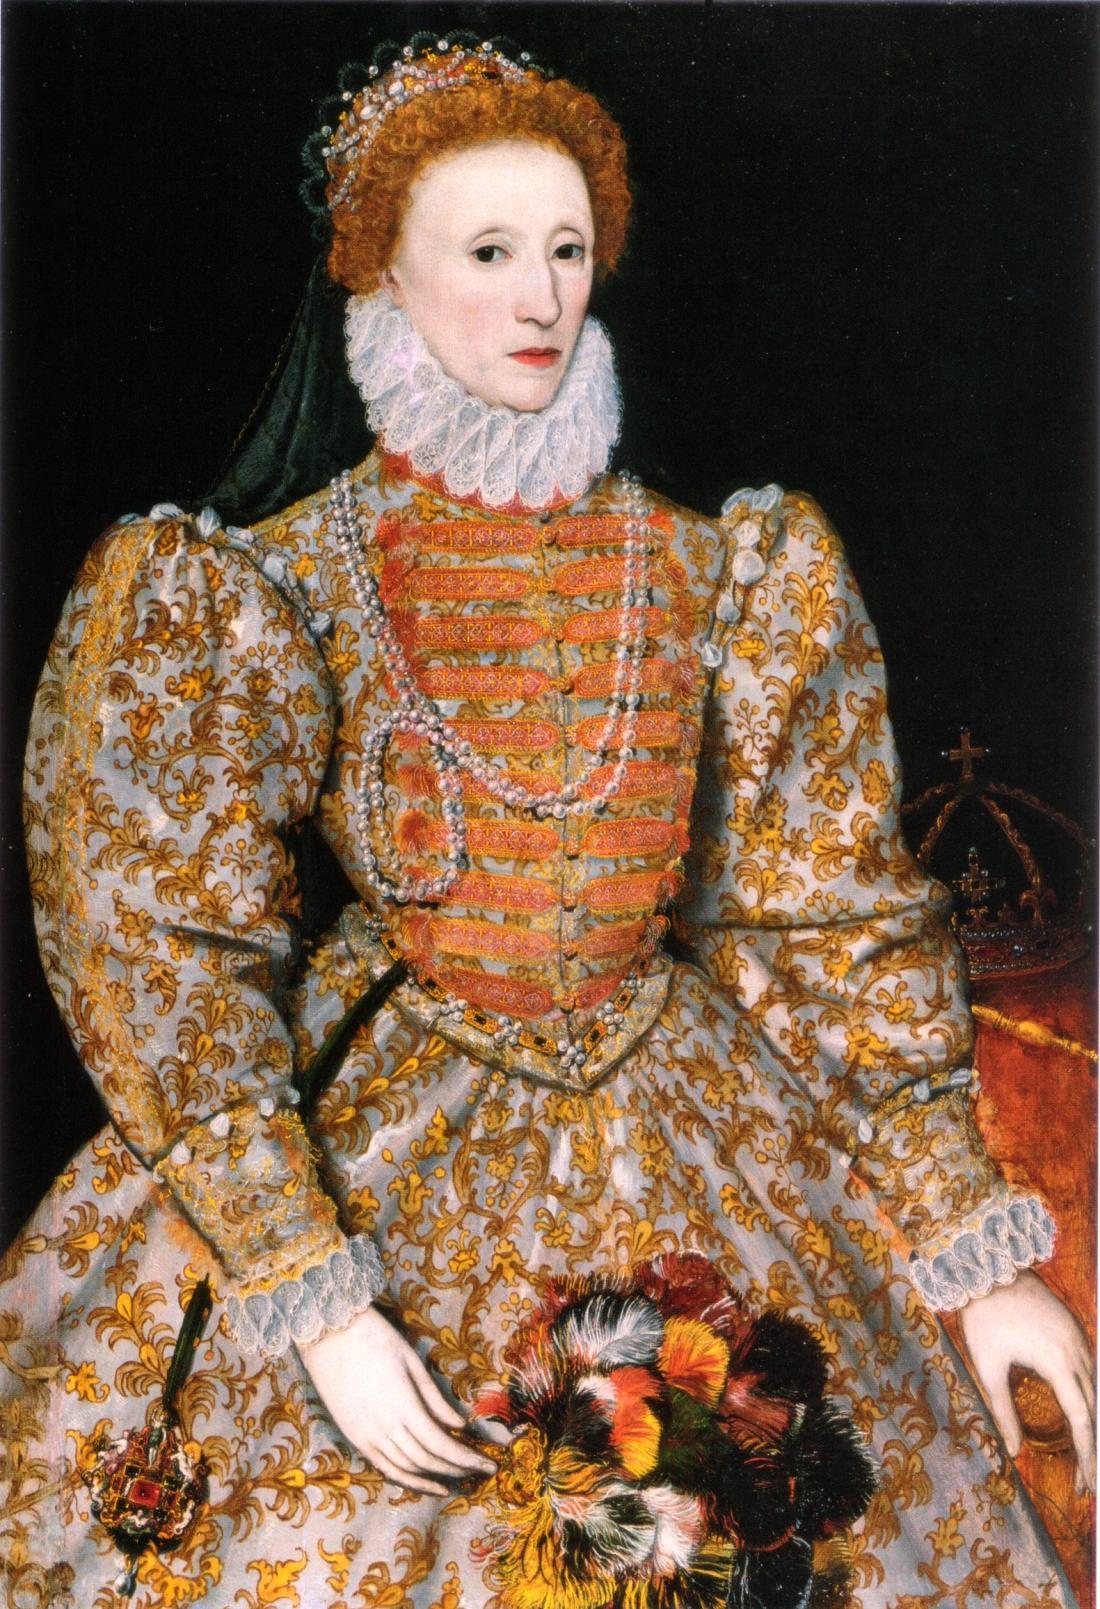 Elizabeth I of England. ca. 1575.